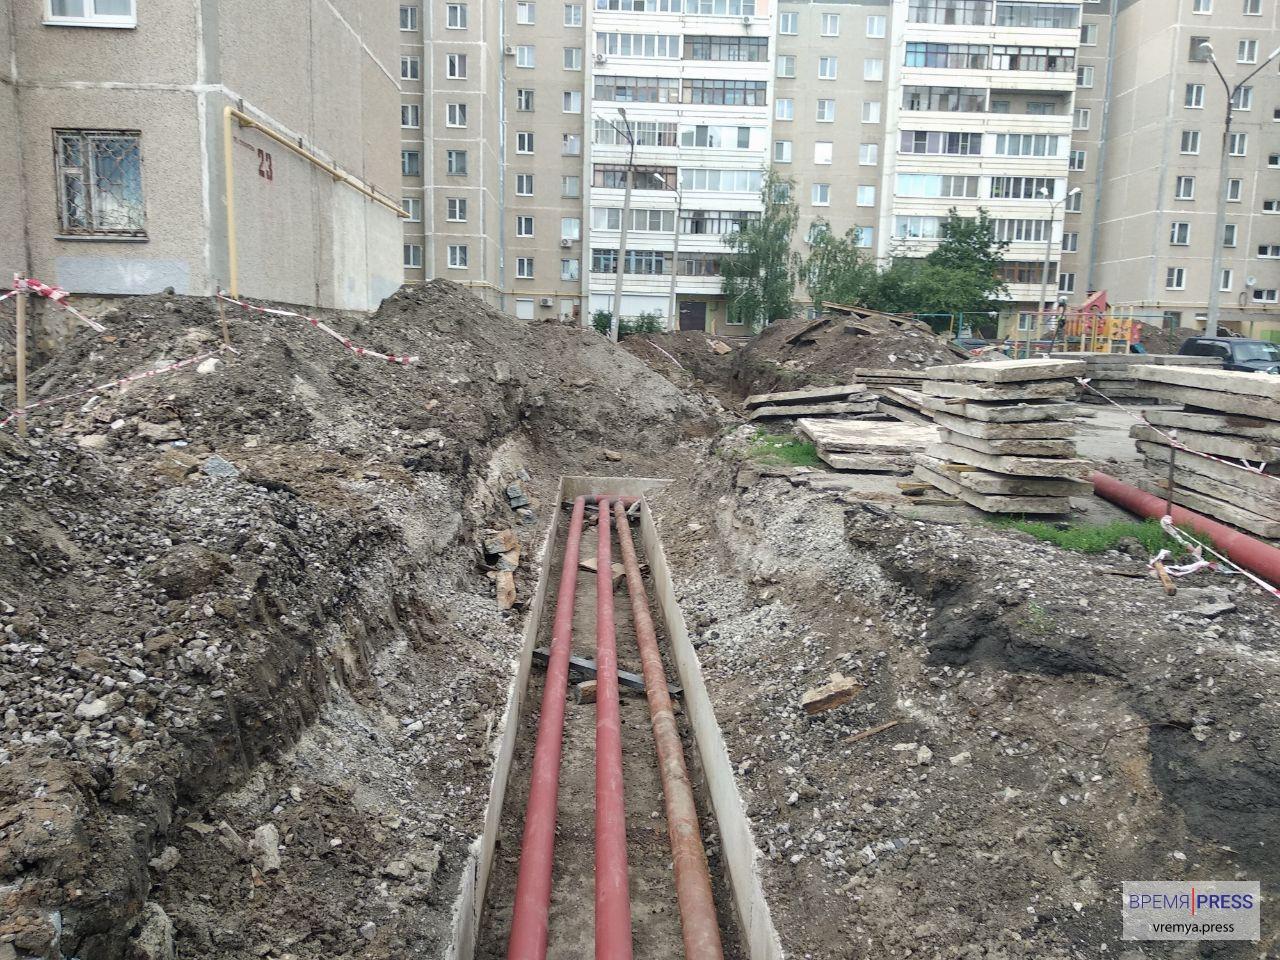 Перекладка тепловой сети стартовала во дворе по Суворова, 23